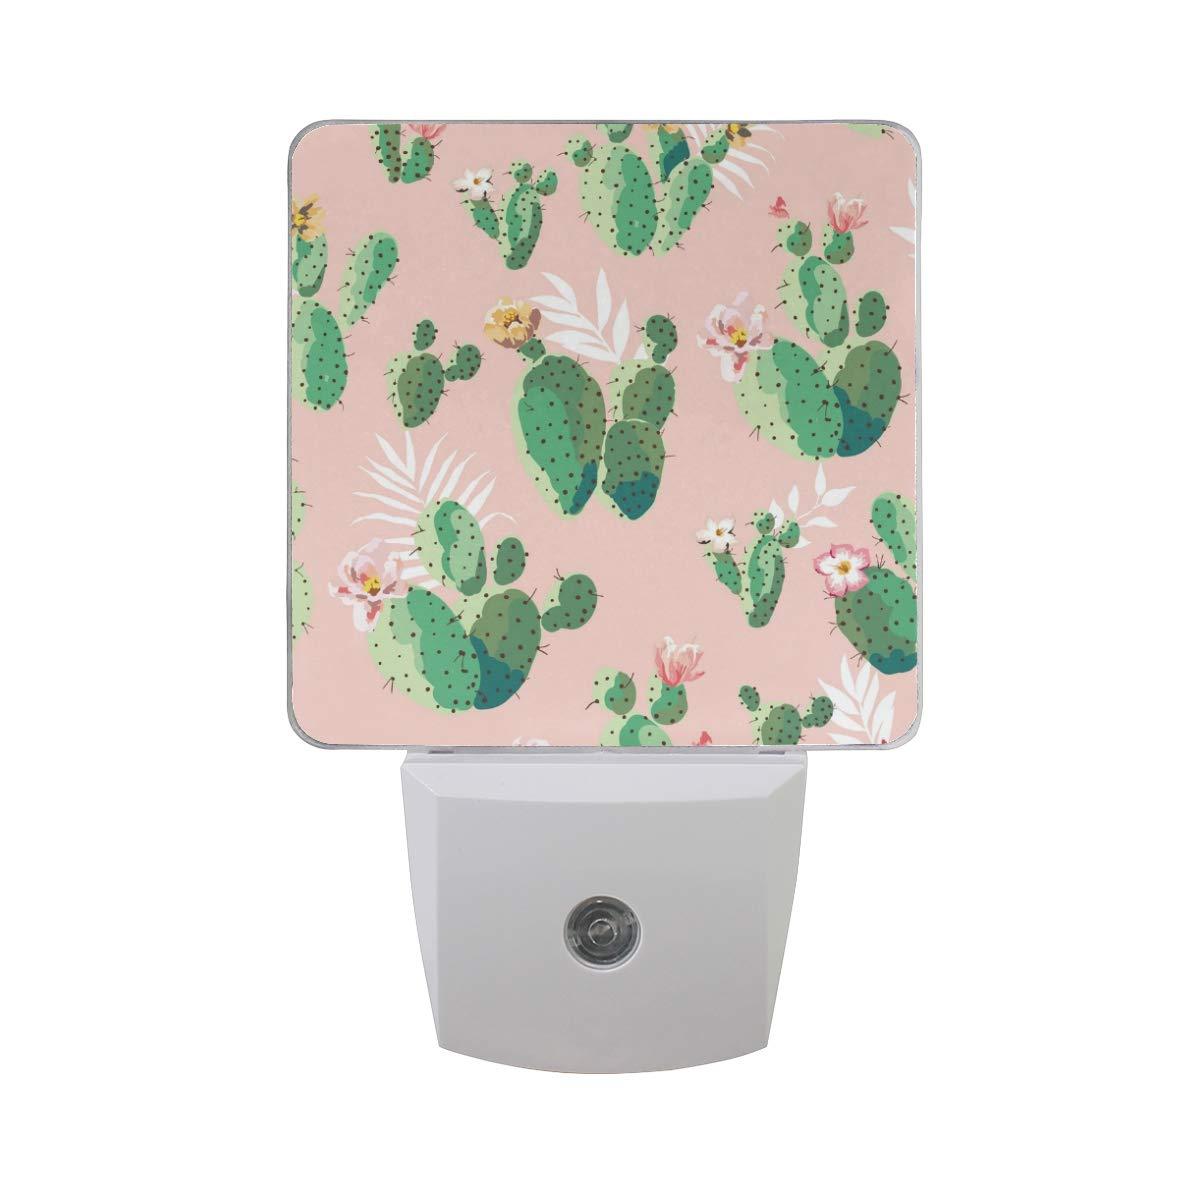 Linomo LED Night Light Lamp Vintage Cacti Cactus Auto Senor Nightlight Plug in for Kids Adults Boys Girls Bedroom Decor, 2 Pack